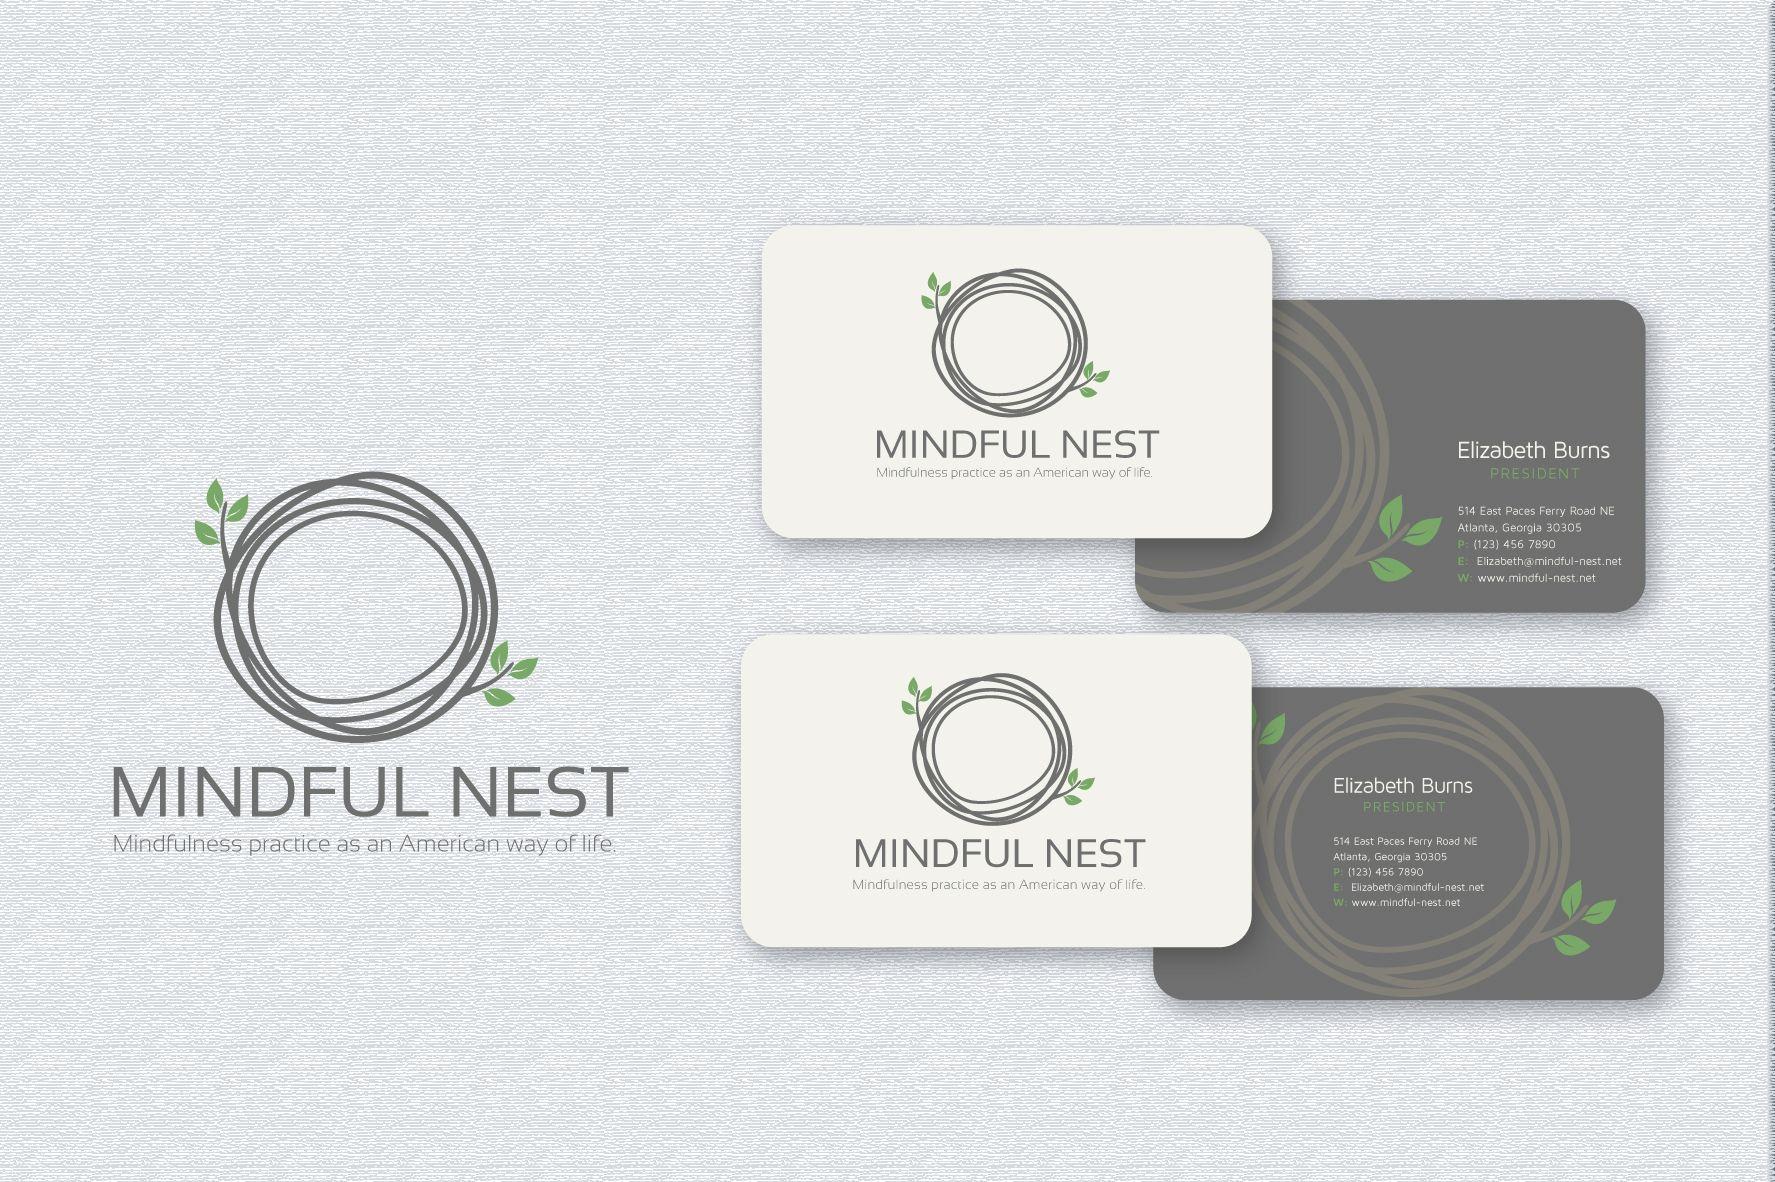 mindful nest business card design